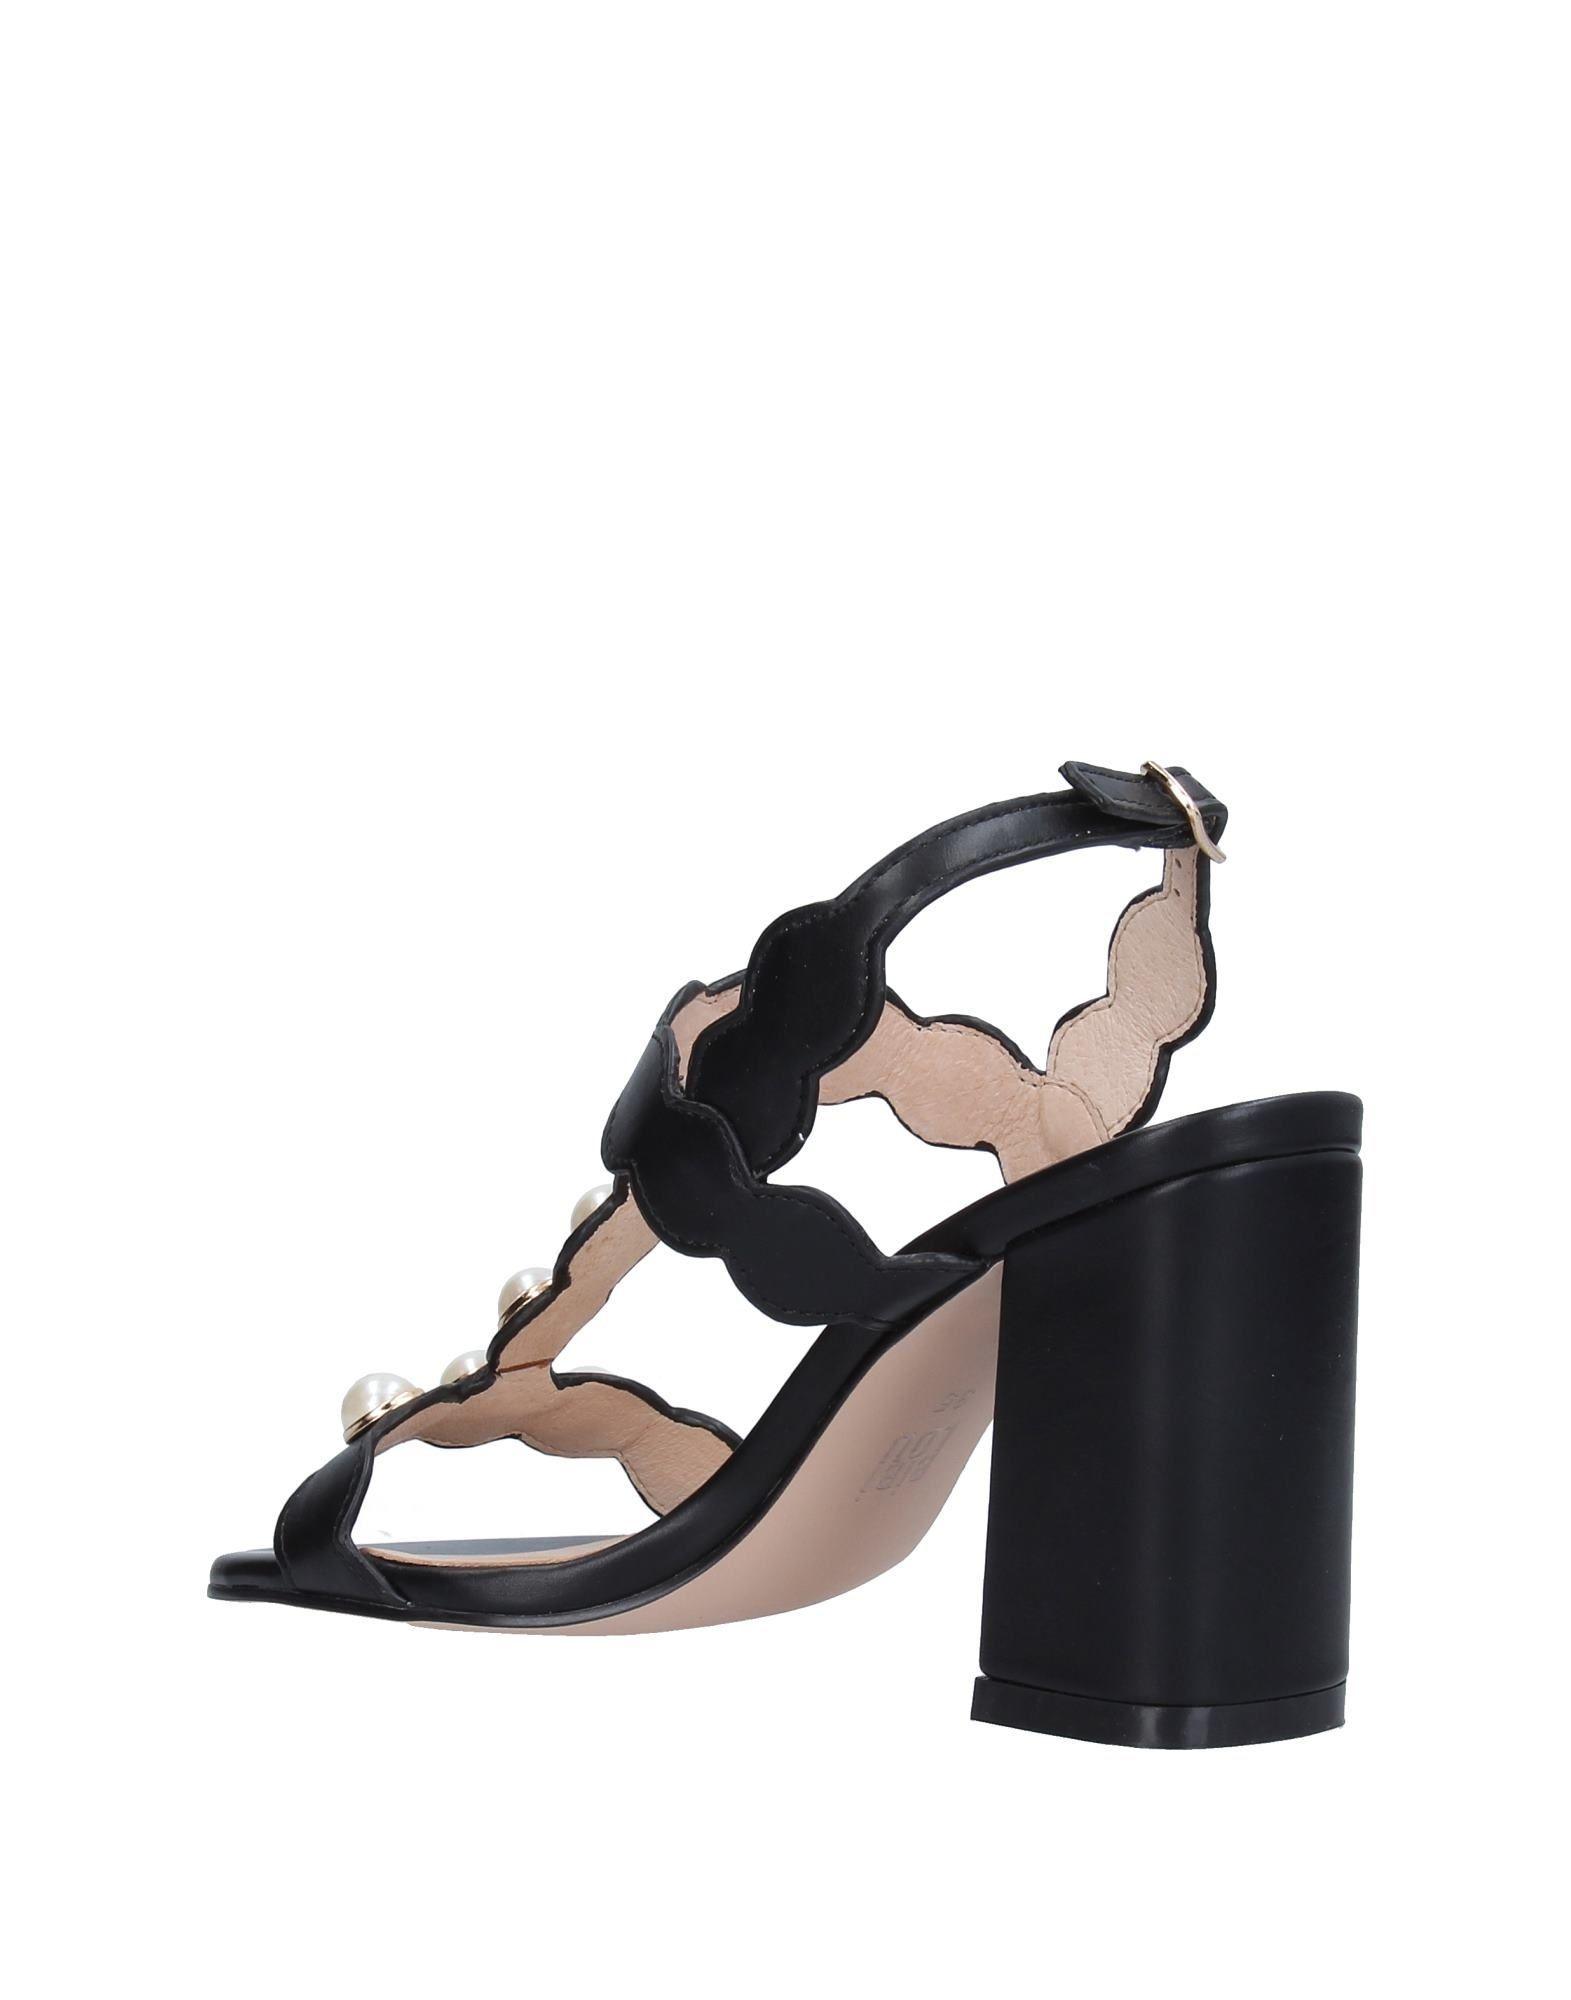 Bibi Lou Black Beaded Leather Heeled Sandals